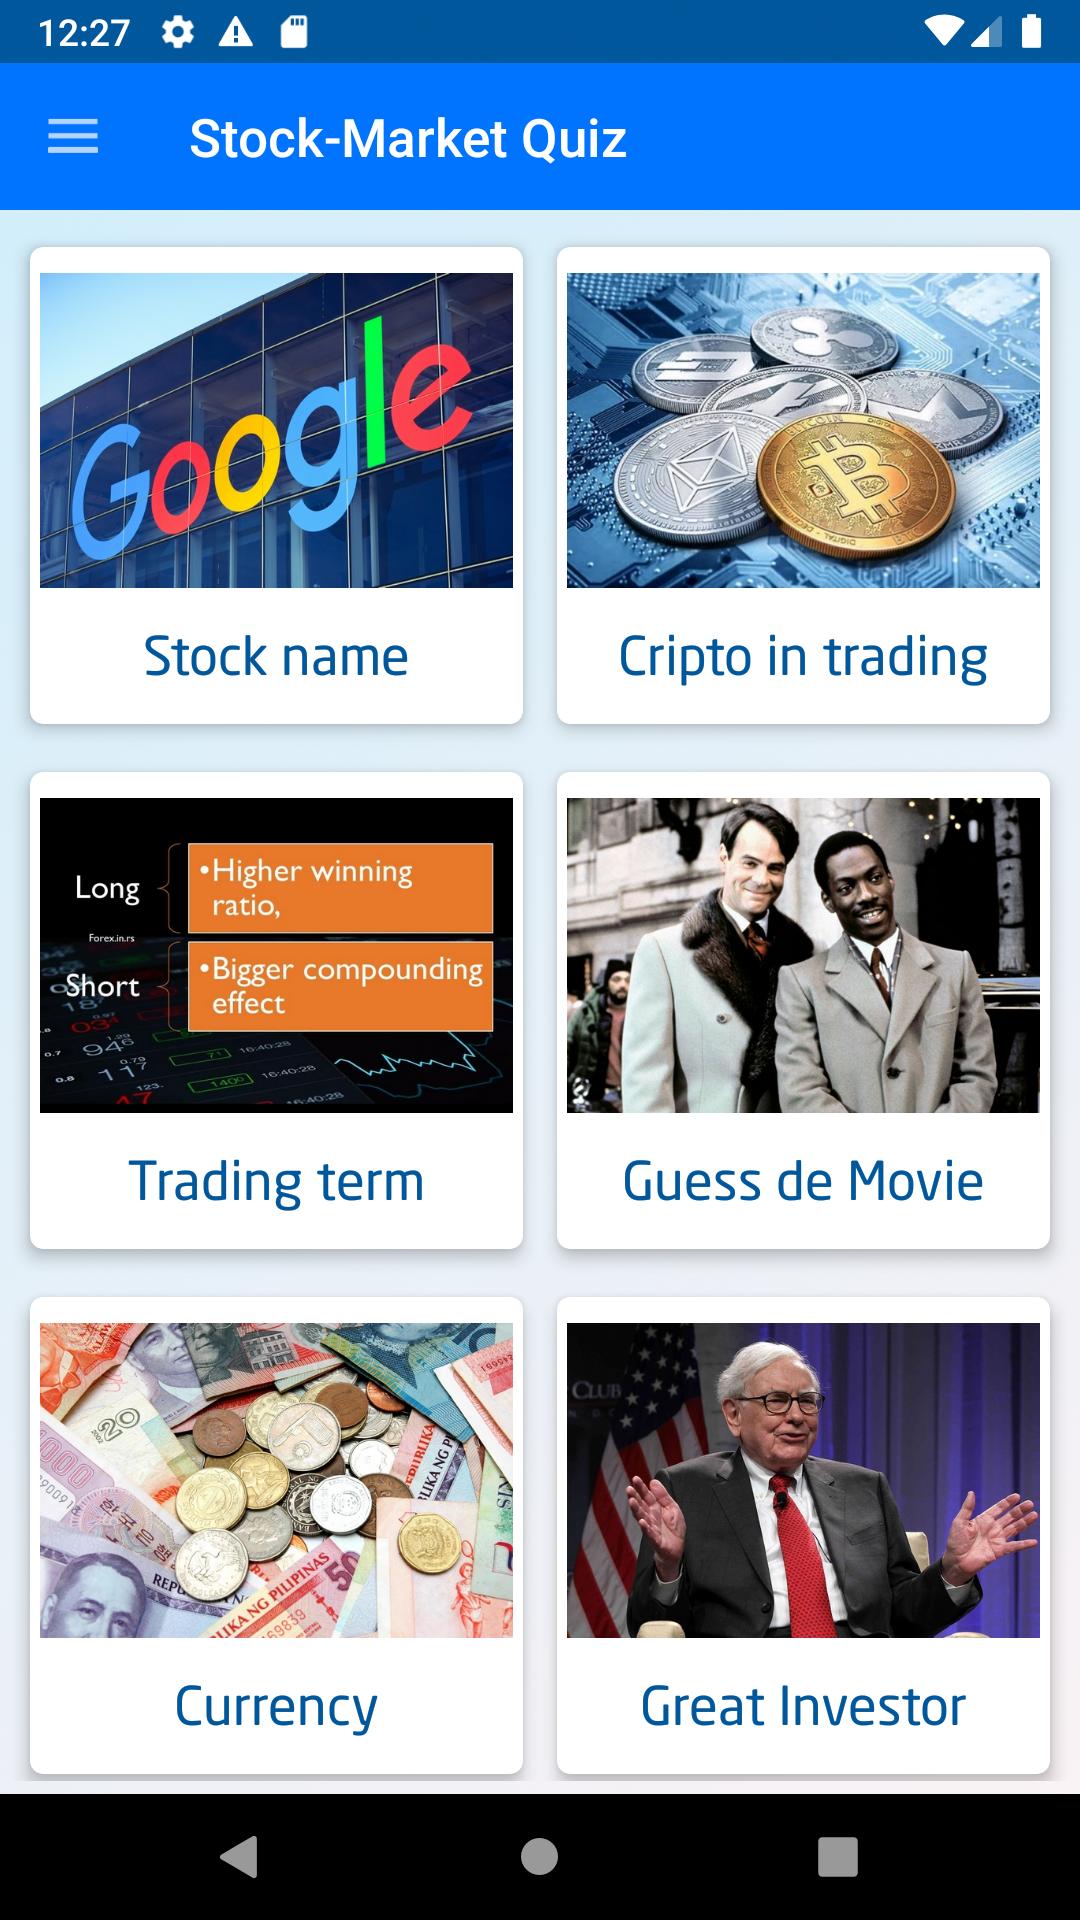 Stock-Market Quiz